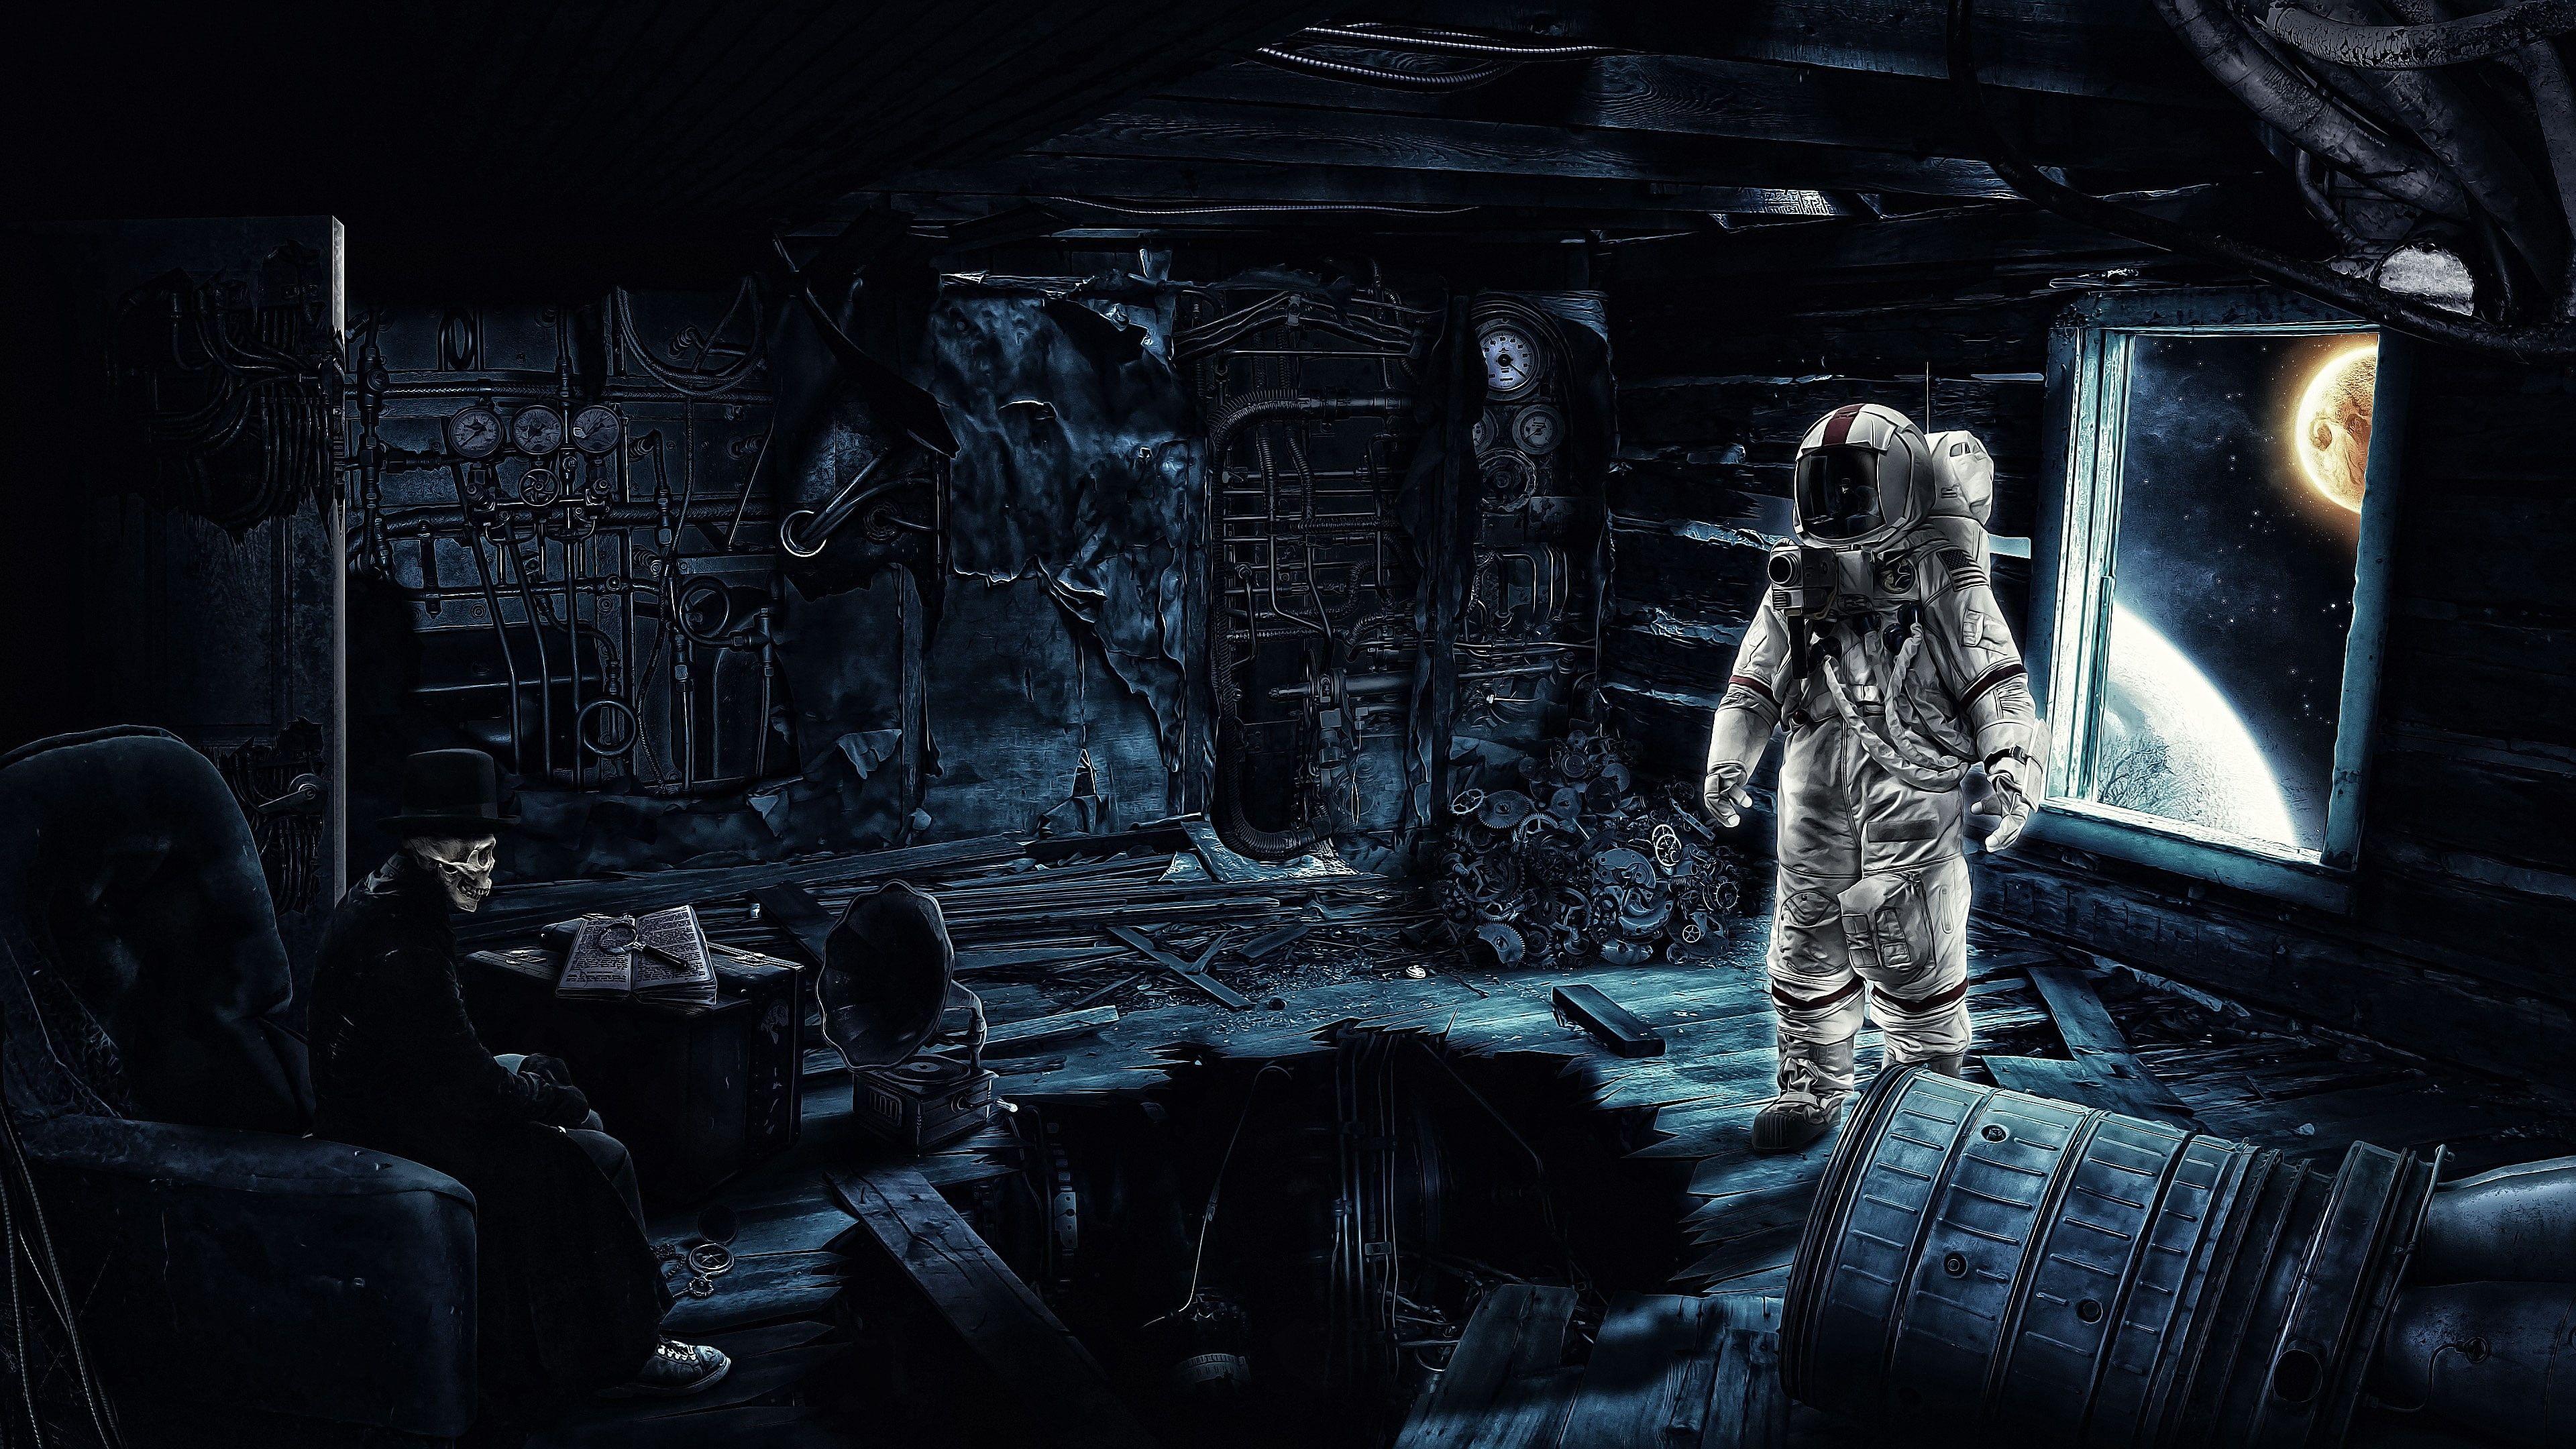 science fiction digital art space art time travel